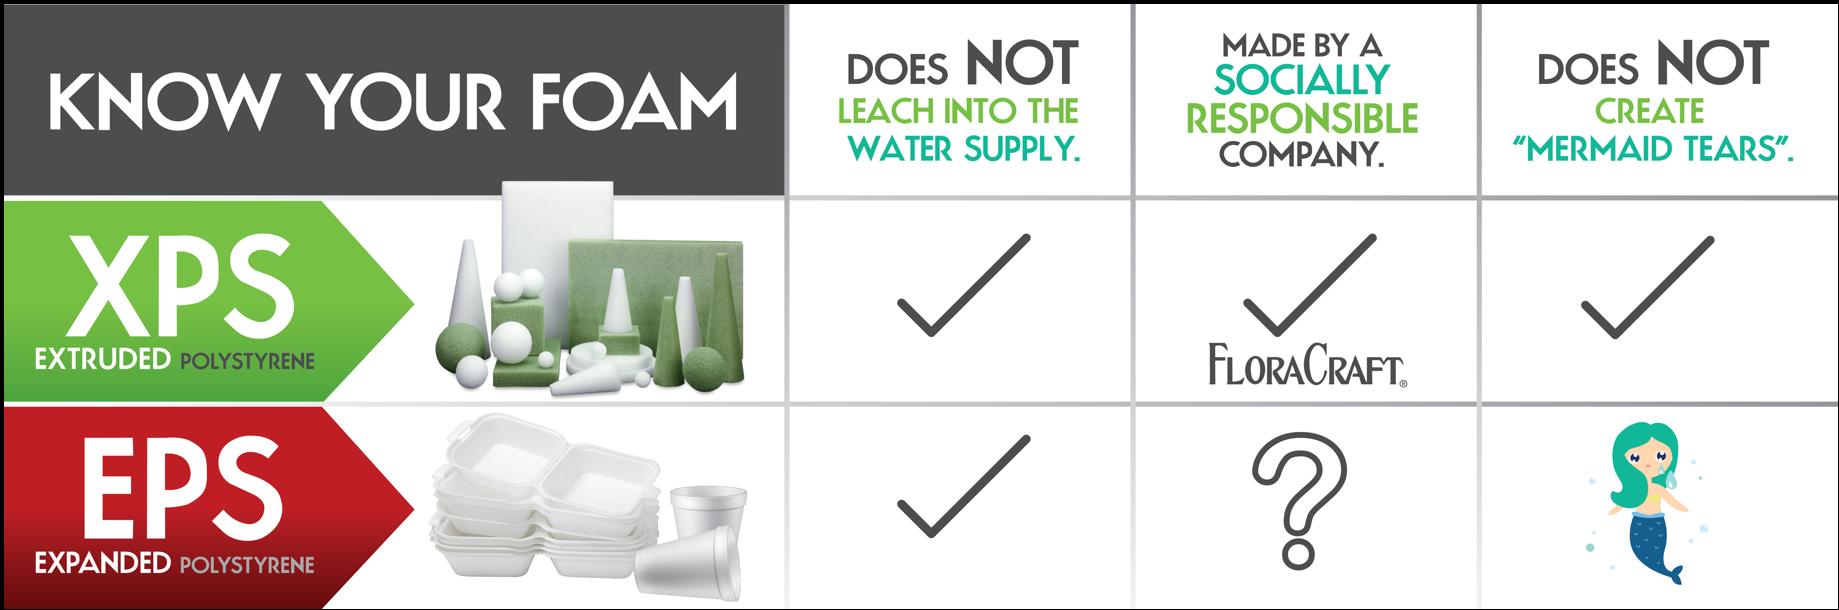 Know your foam